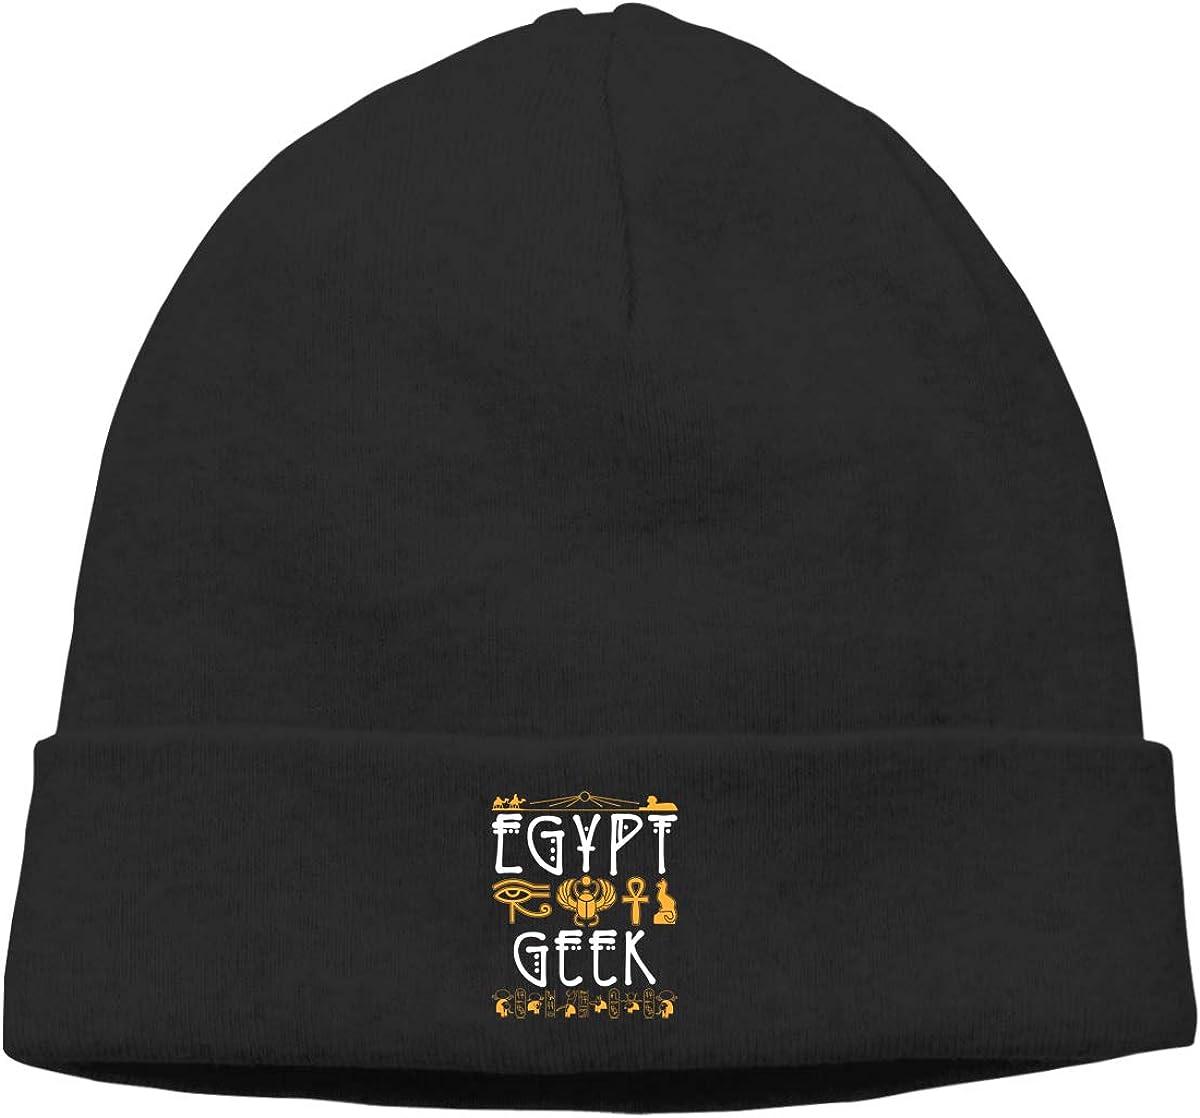 Riokk az Egyptology Archaeology Knit Cap Knit Hat Skull for Mens Black